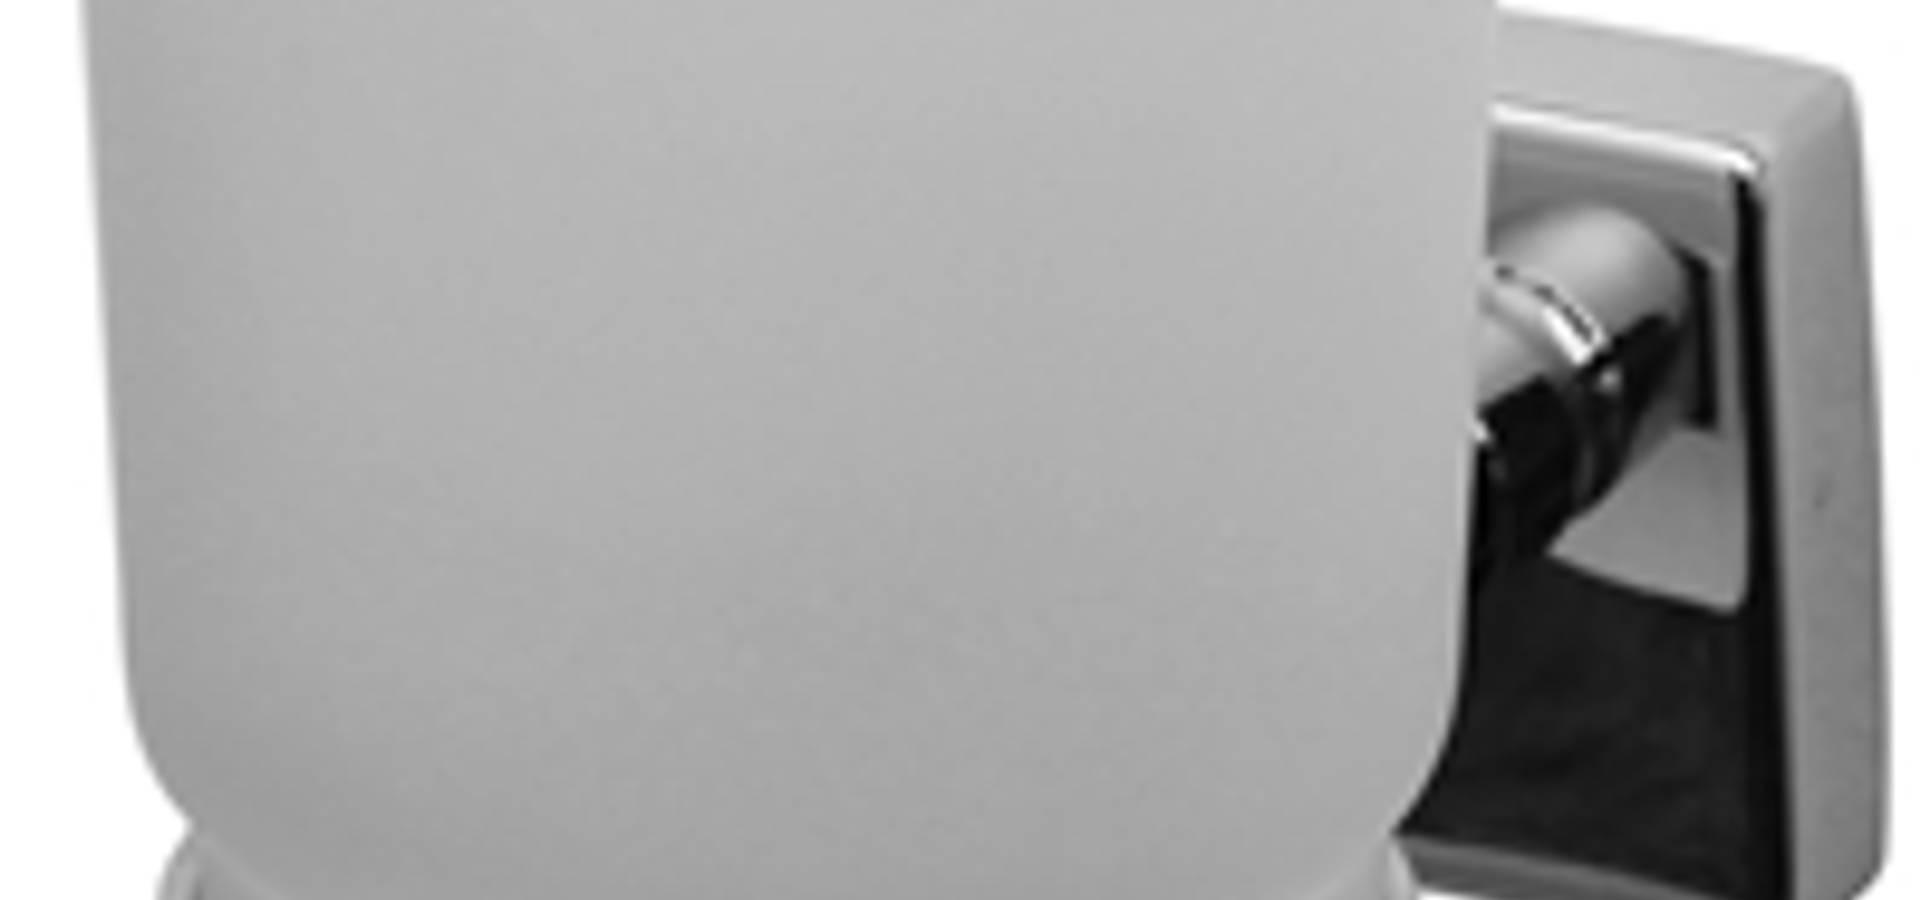 ÇELEBİ YAPI OTEL BANYO MUTFAK AKSESUARLARI İTH.İHR.SAN.TİC.LTD.ŞTİ